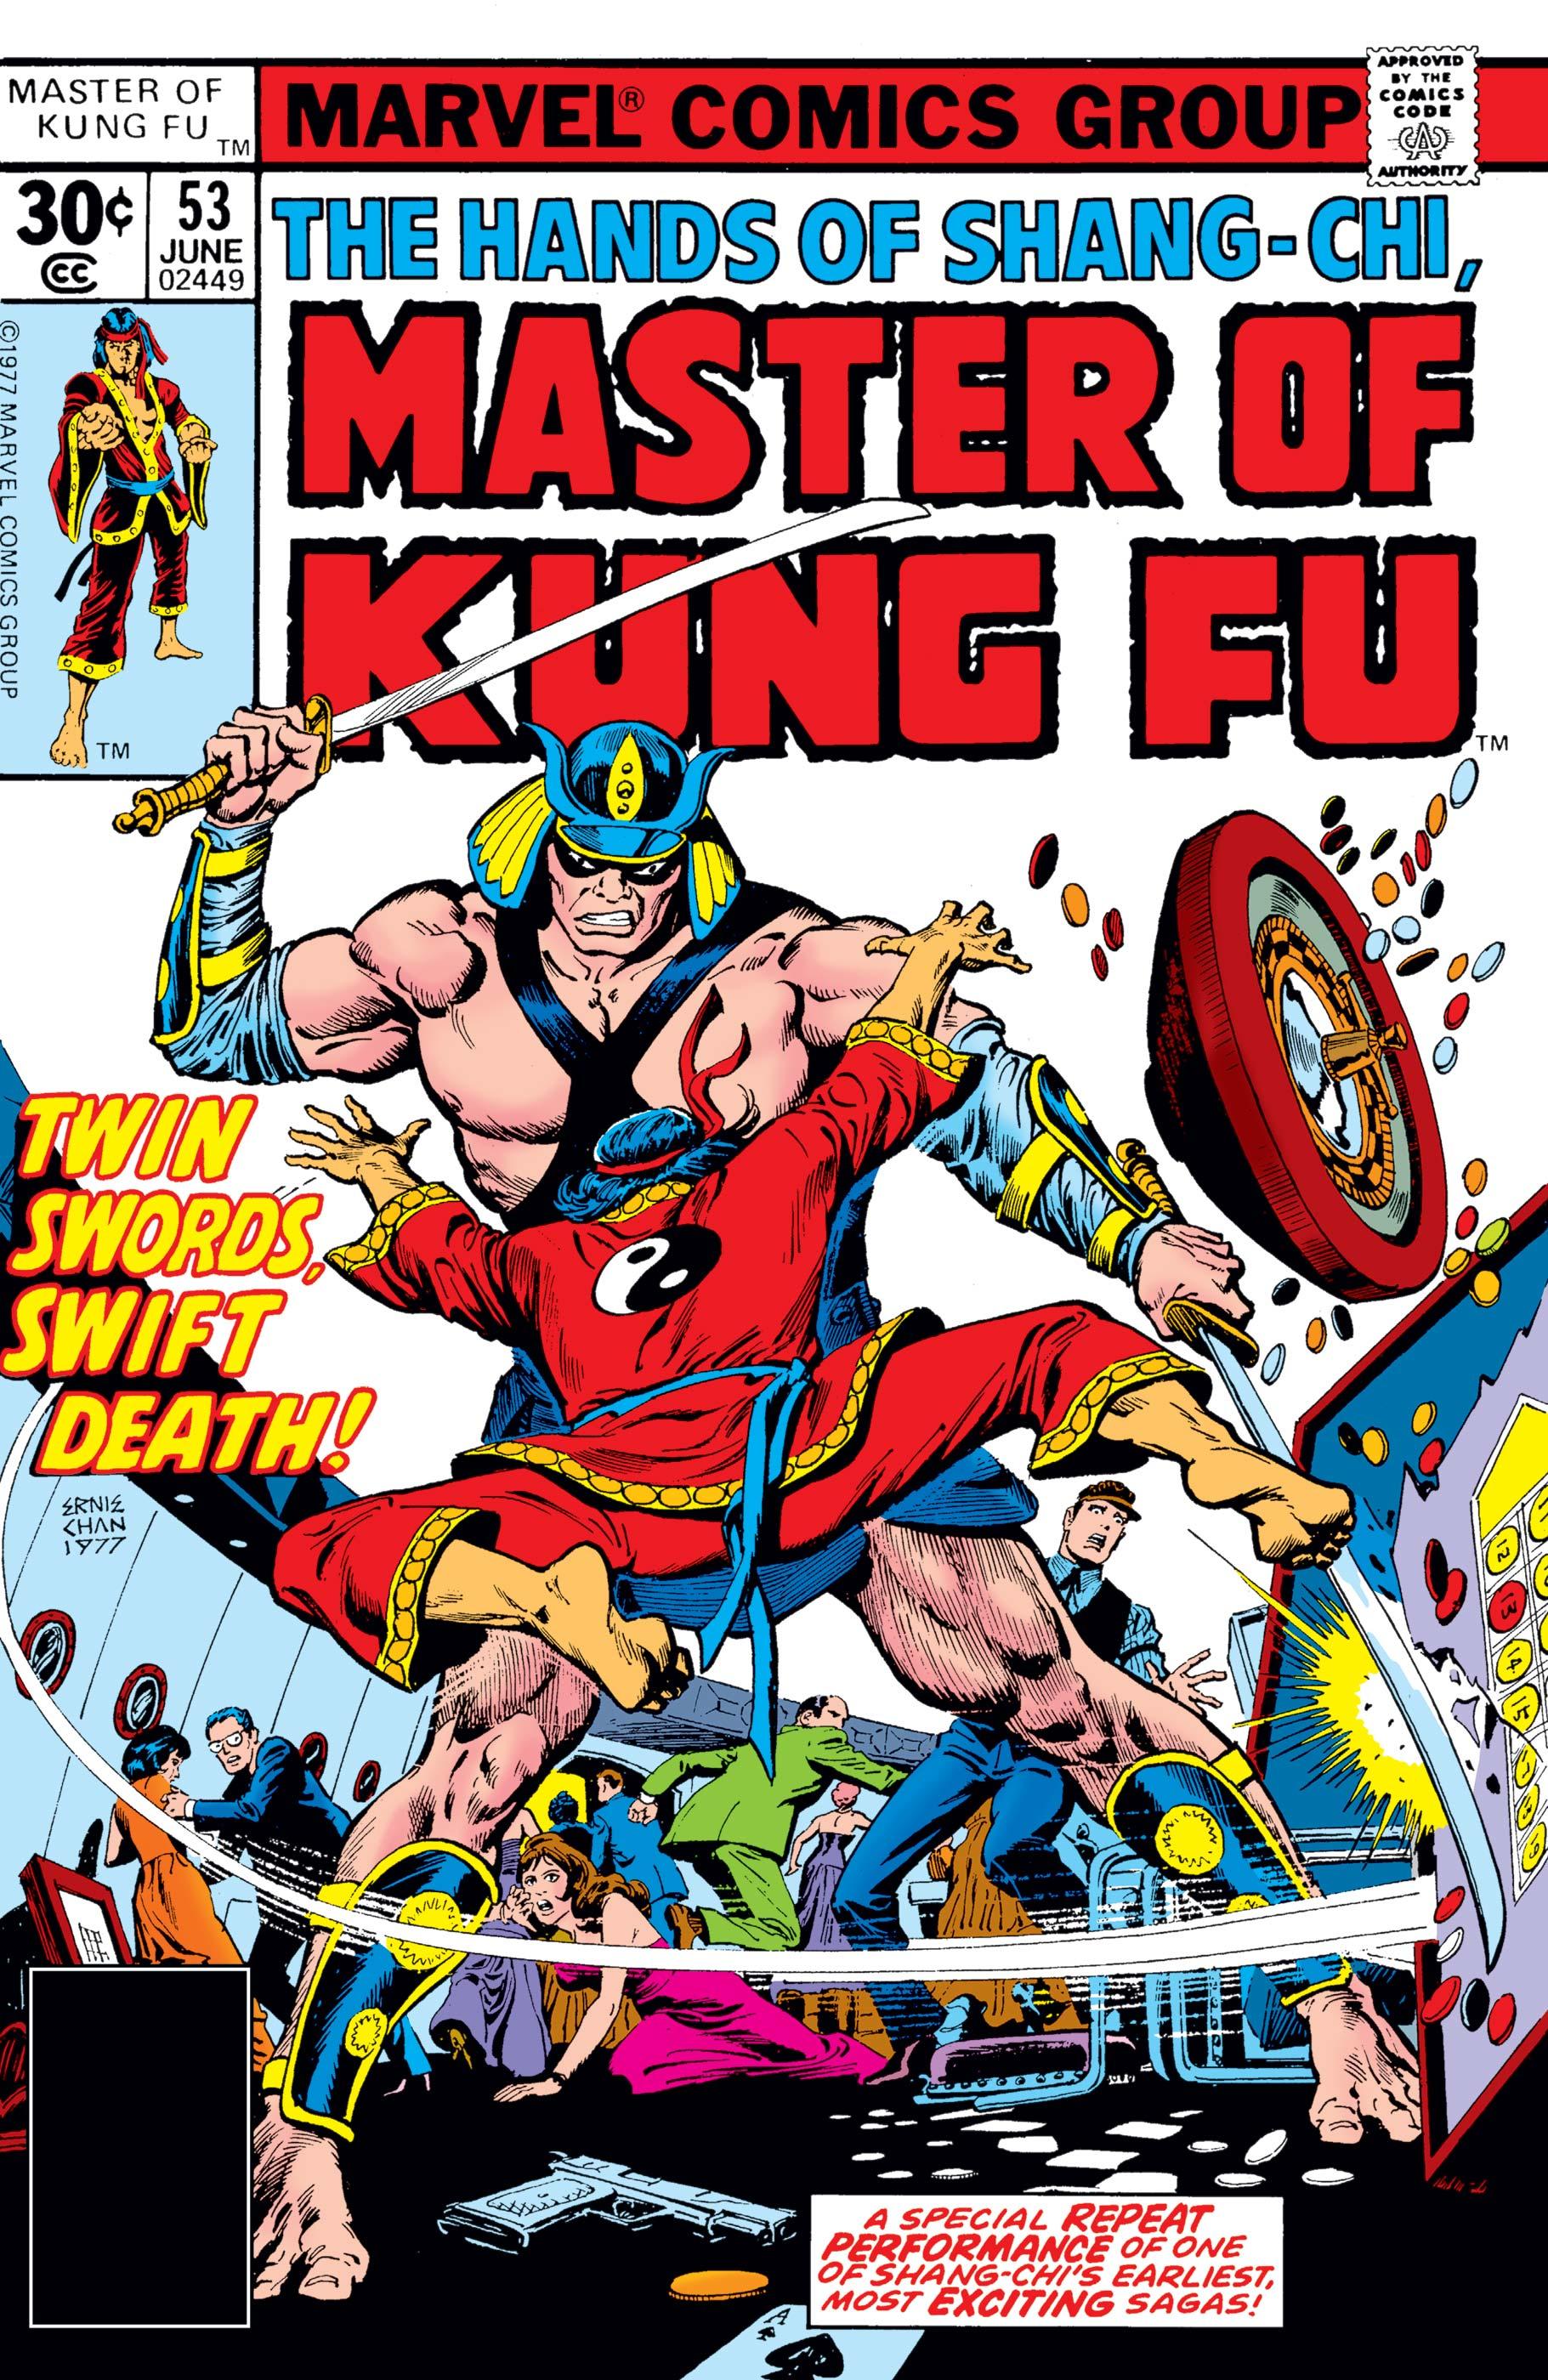 Master of Kung Fu (1974) #53